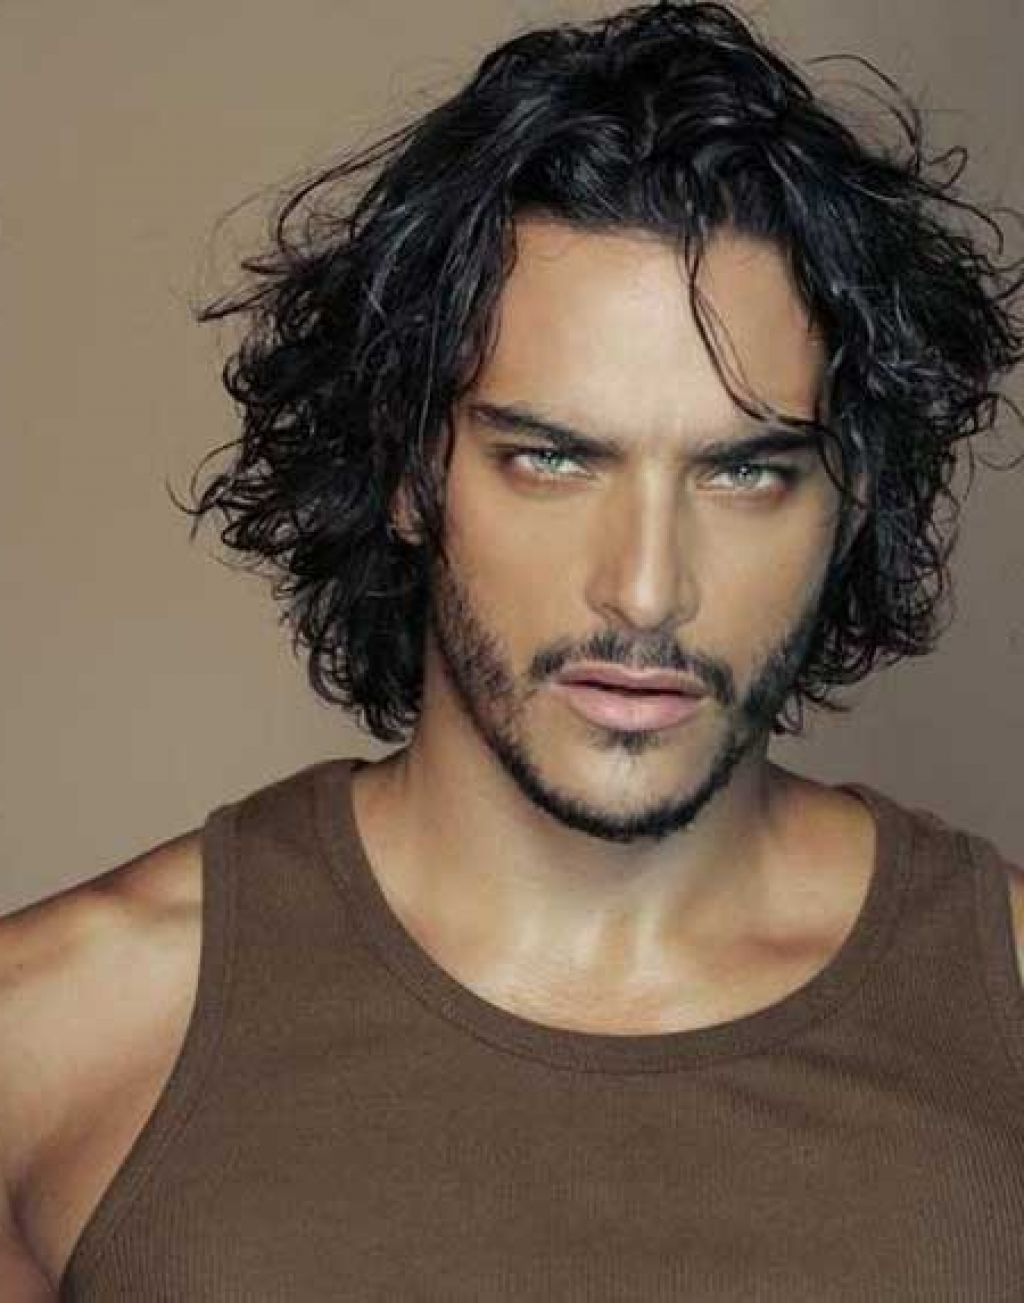 Hot mens haircuts pin by love blaze on fav men  pinterest  hair styles long hair